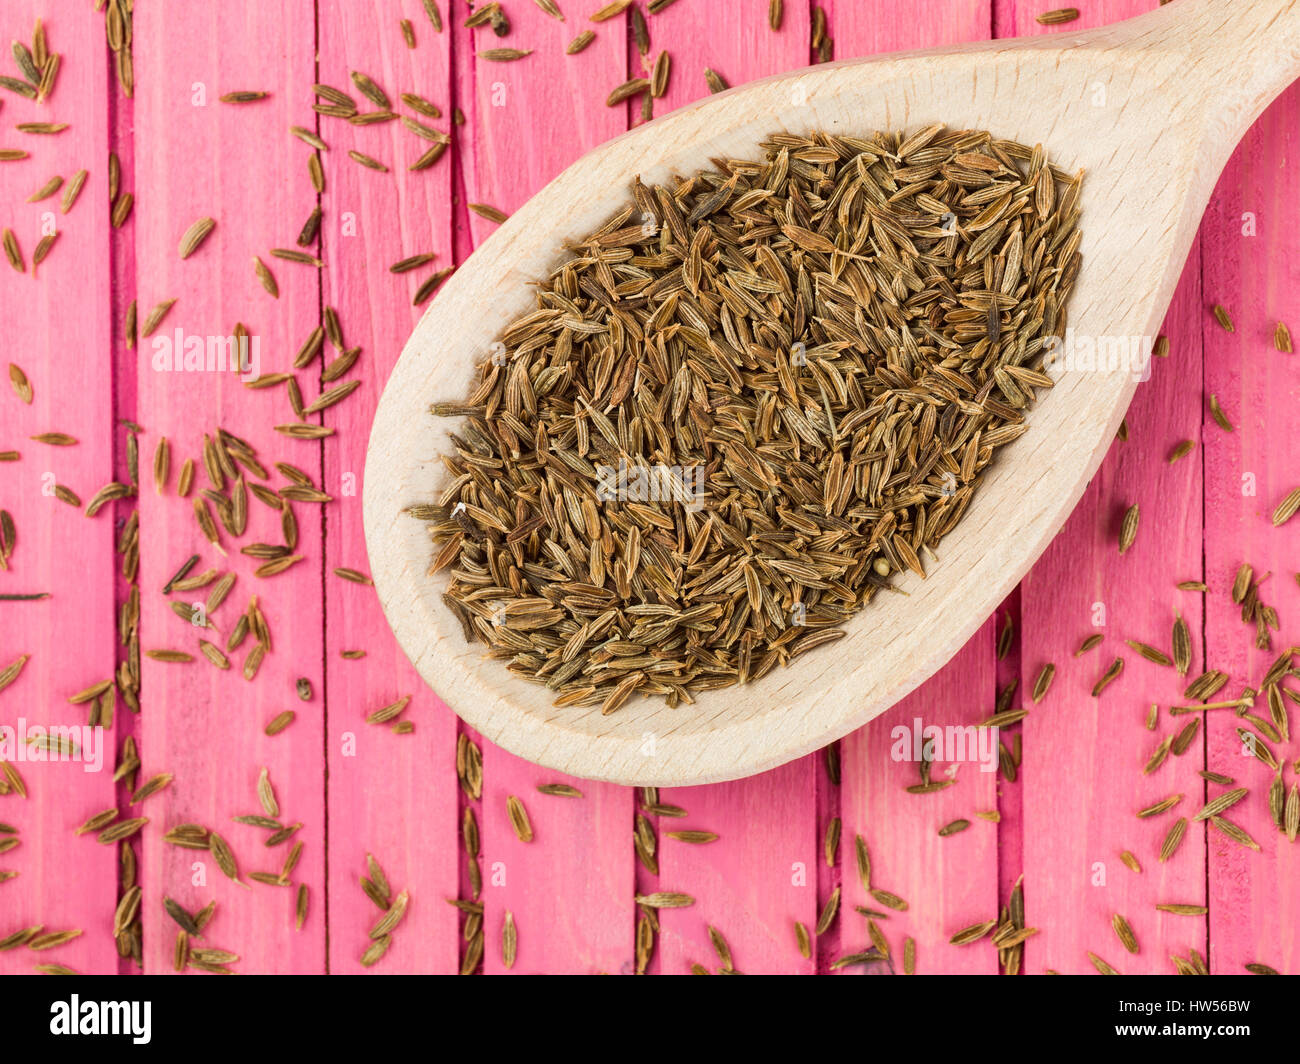 Cucchiaio di secche semi di cumino spice Immagini Stock